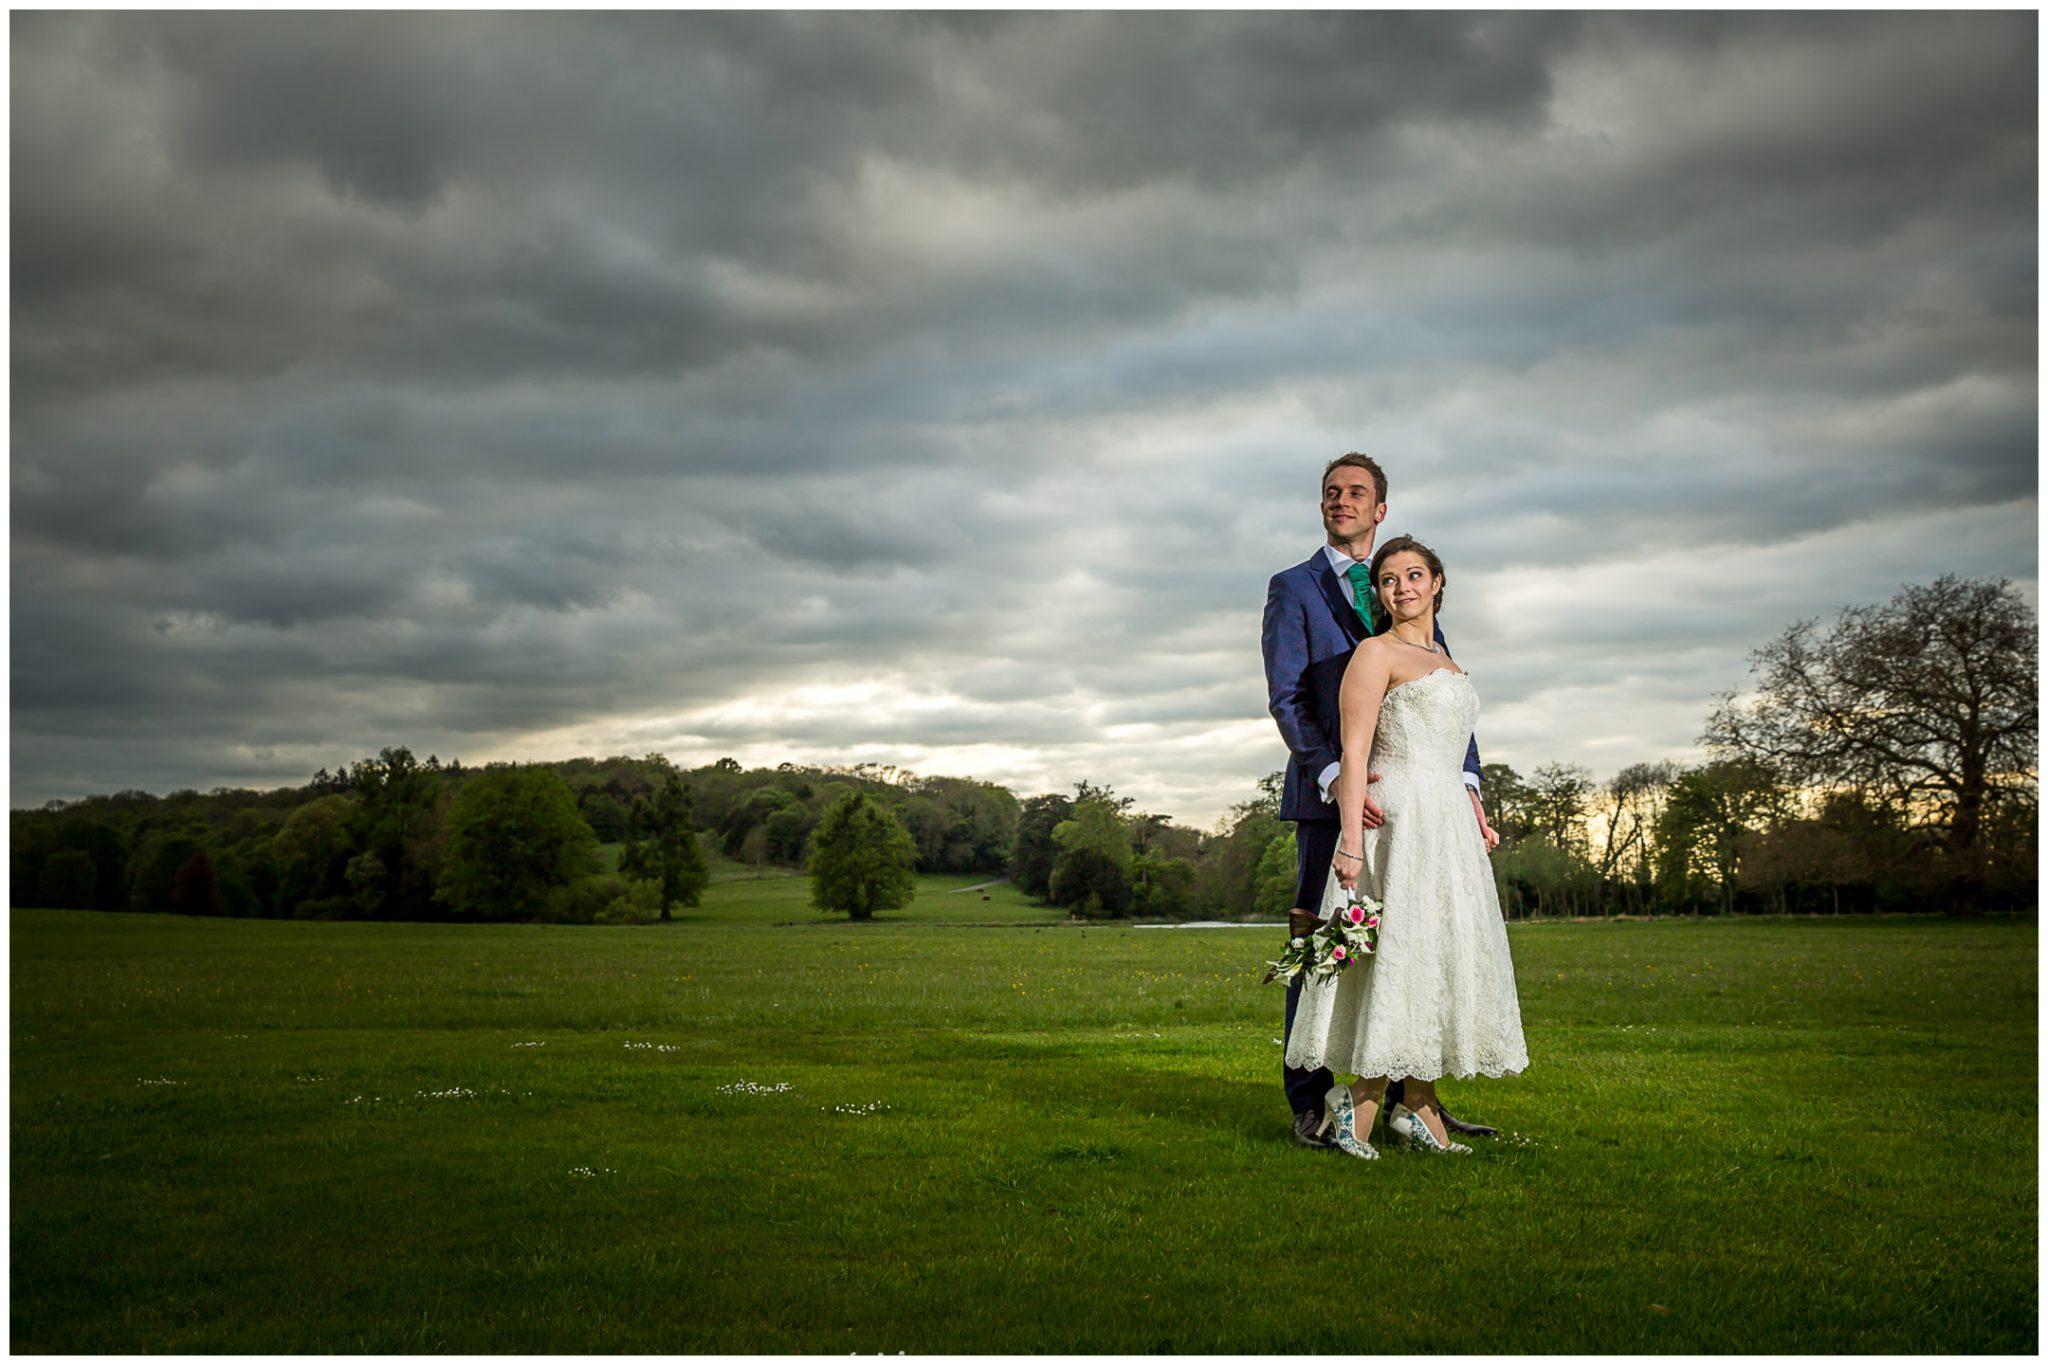 Avington Park wedding photography bride and groom in gardens